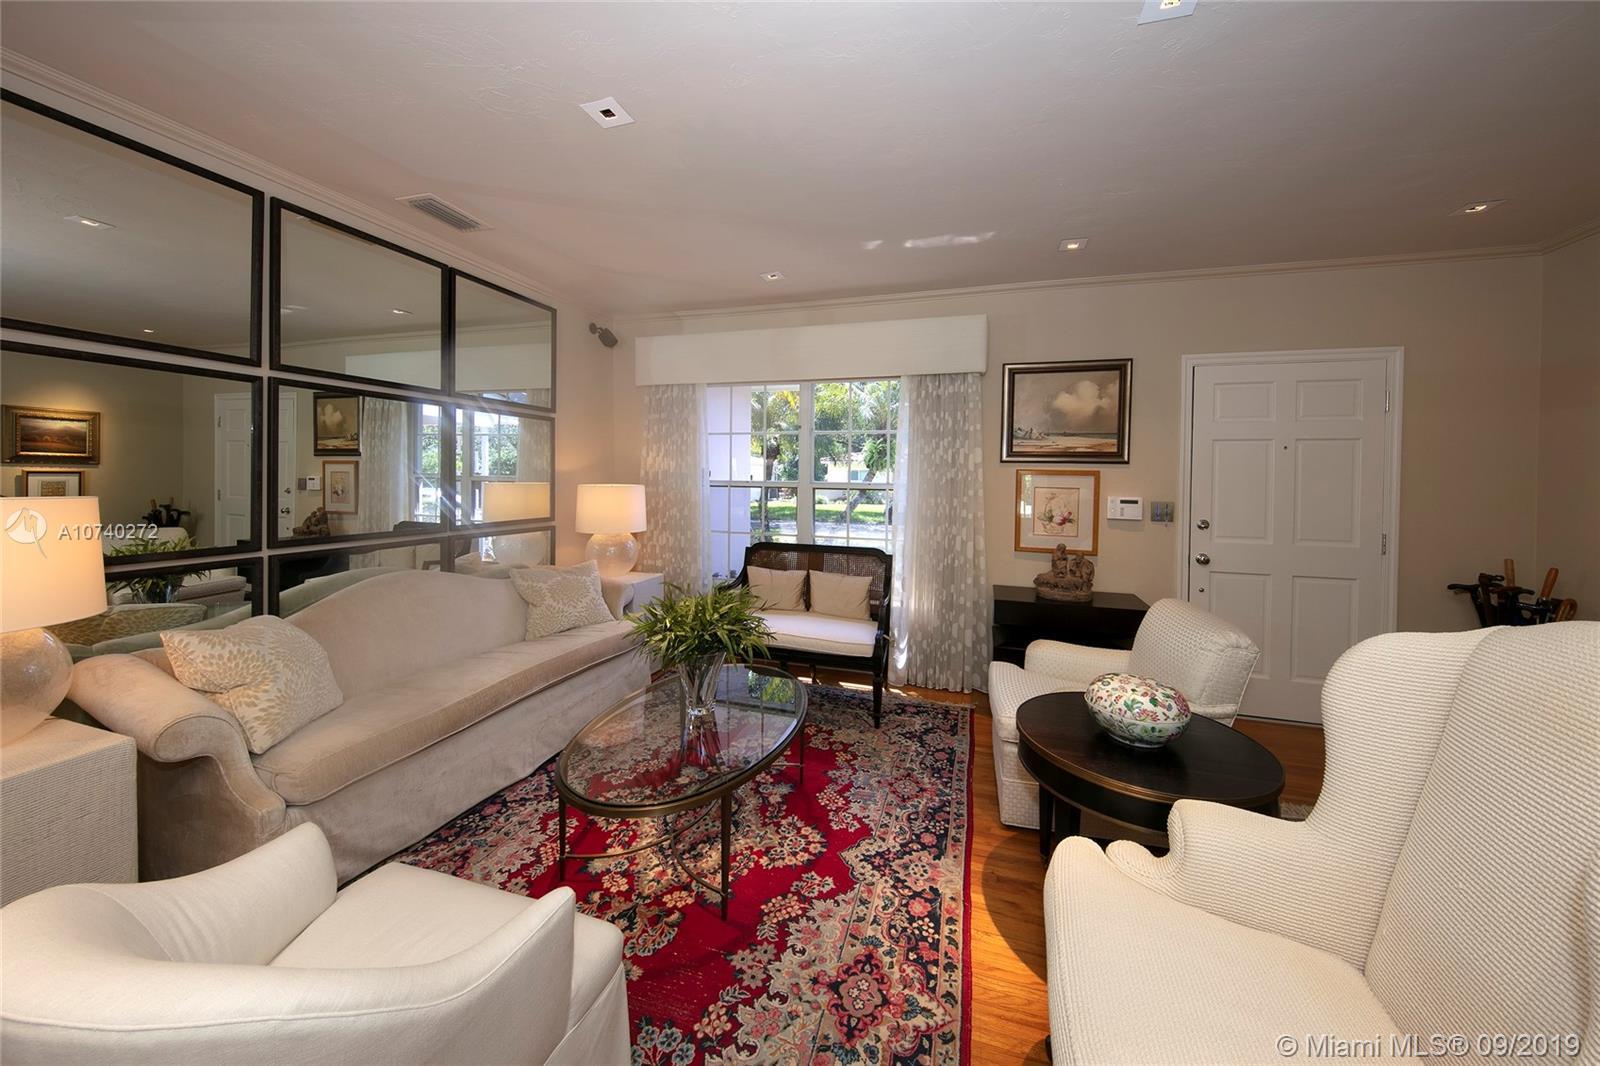 1221 Andora Ave, Coral Gables, FL 33146